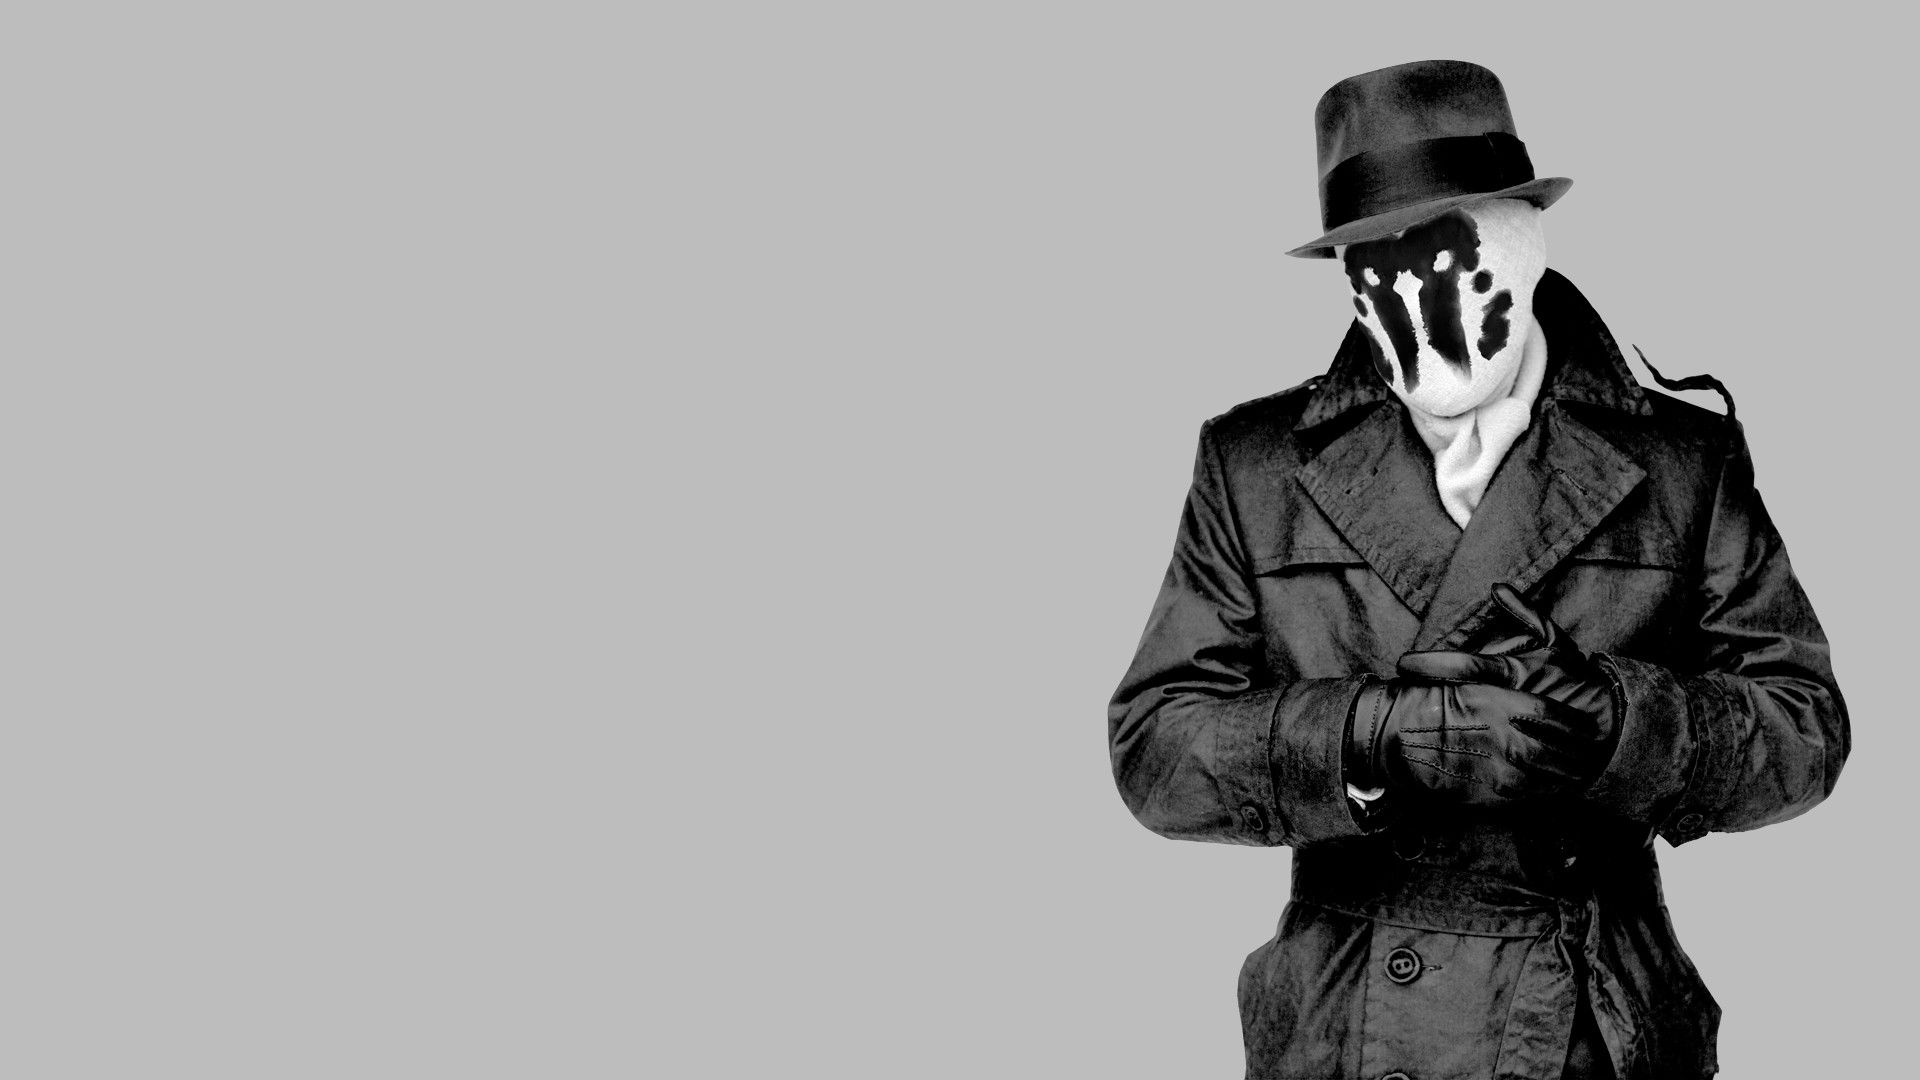 Rorschach desktop image